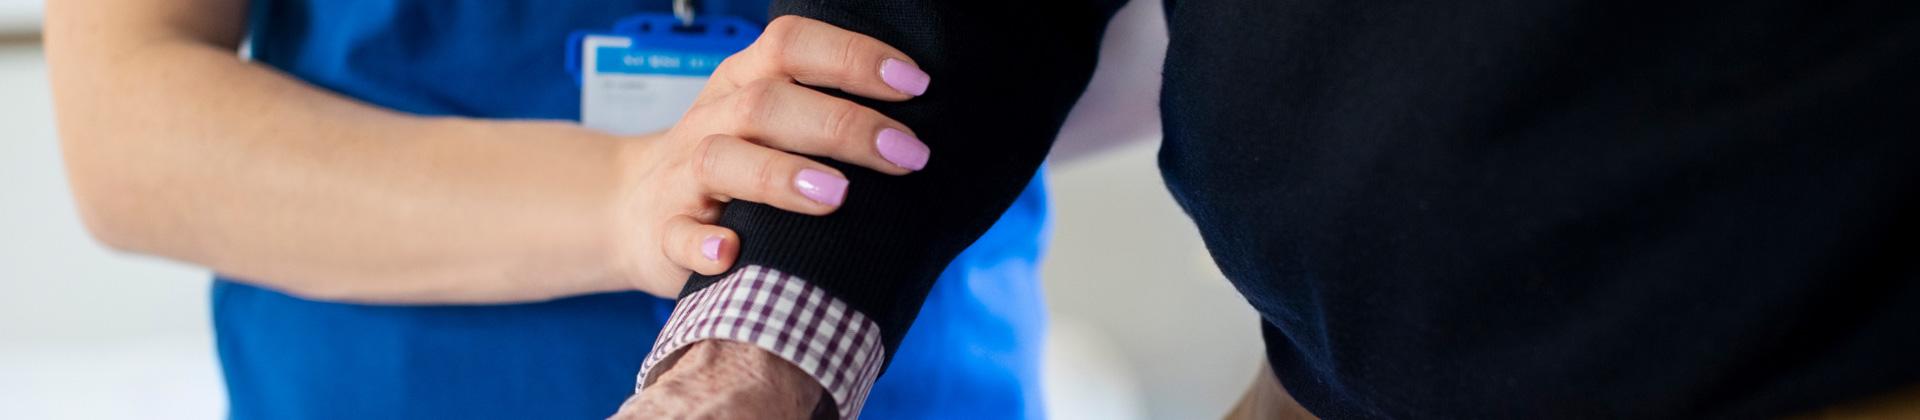 a nurse s hand on an older gentleman s arm